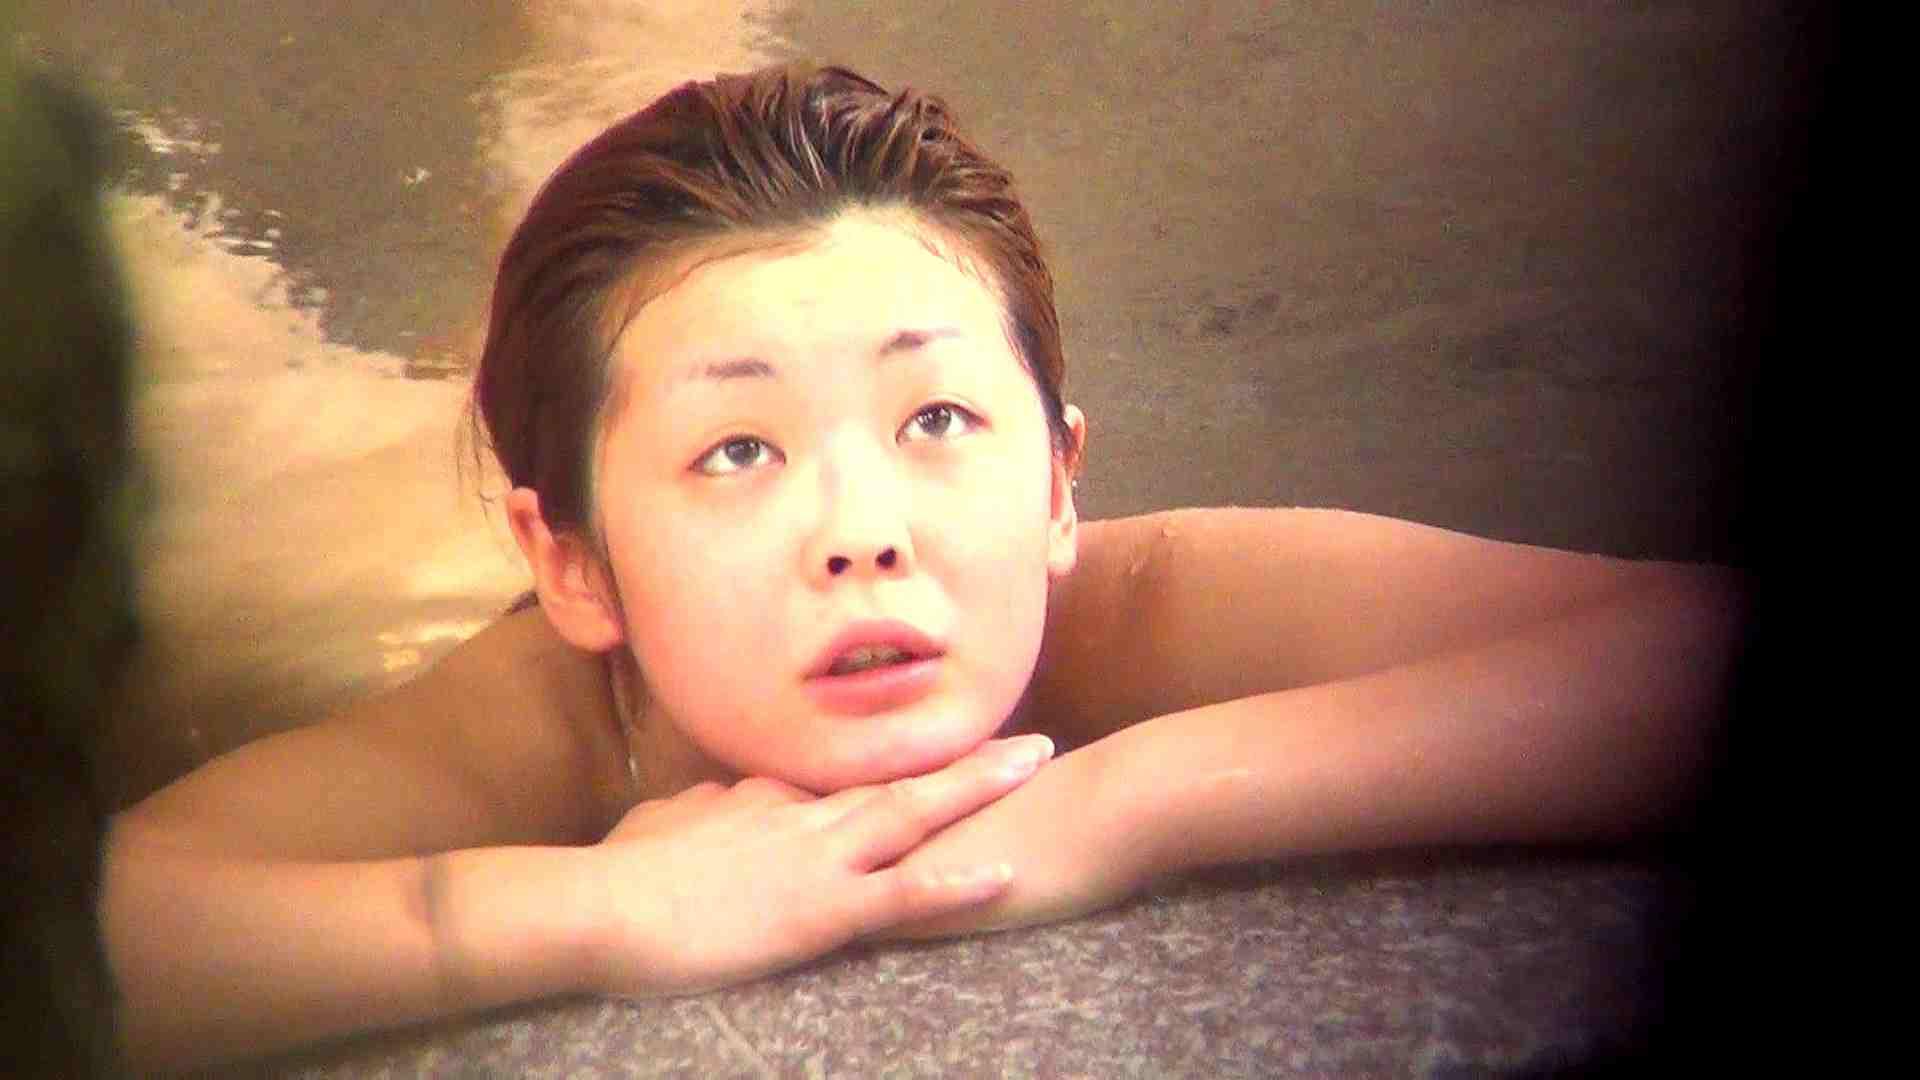 Aquaな露天風呂Vol.288 盗撮シリーズ | 露天風呂編  79PIX 65